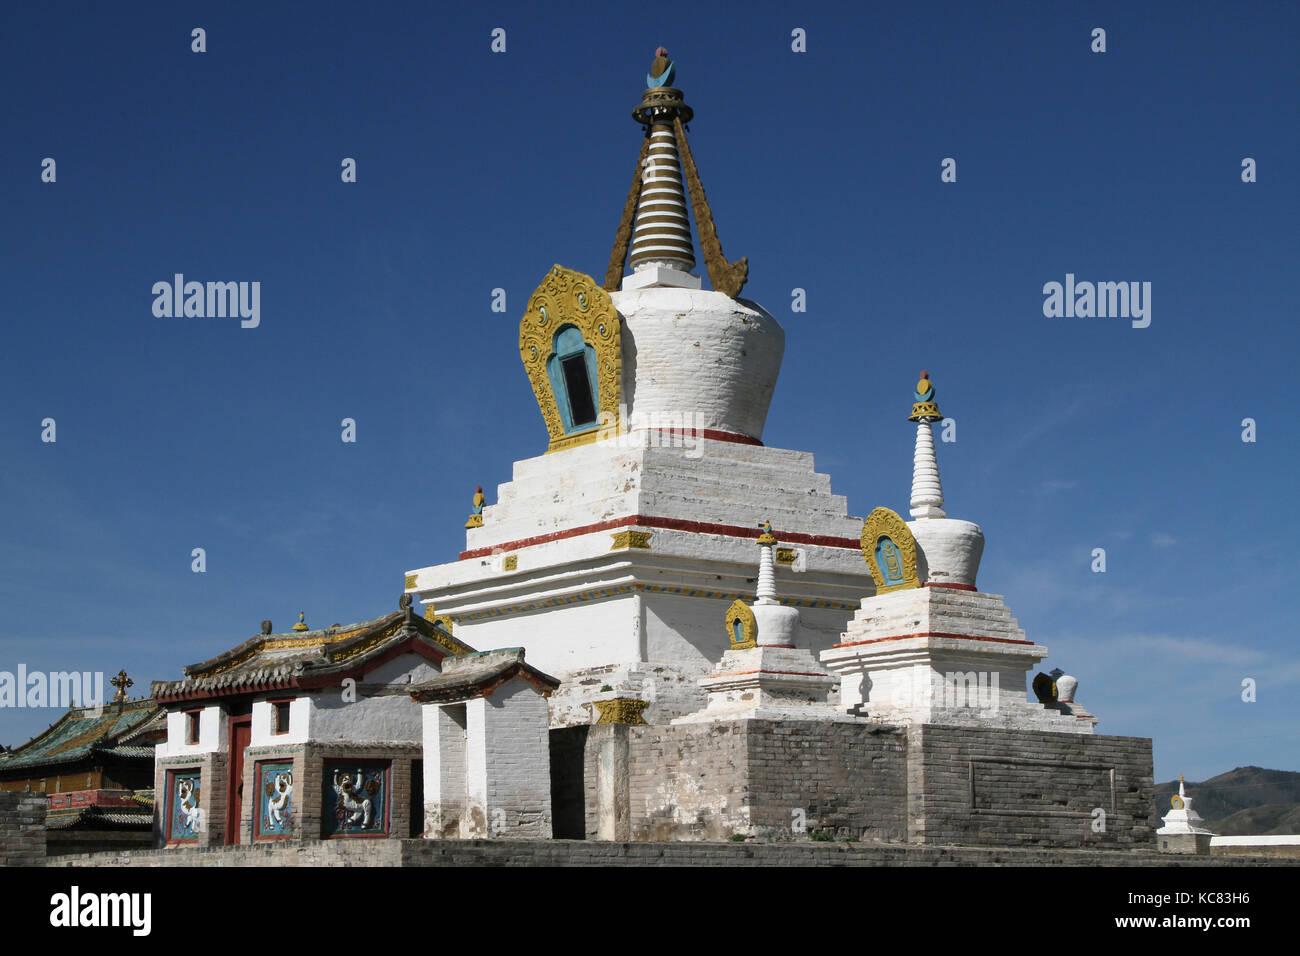 White stupa in Erdene Zuu Monastery, Kharkorin, Mongolia - Stock Image